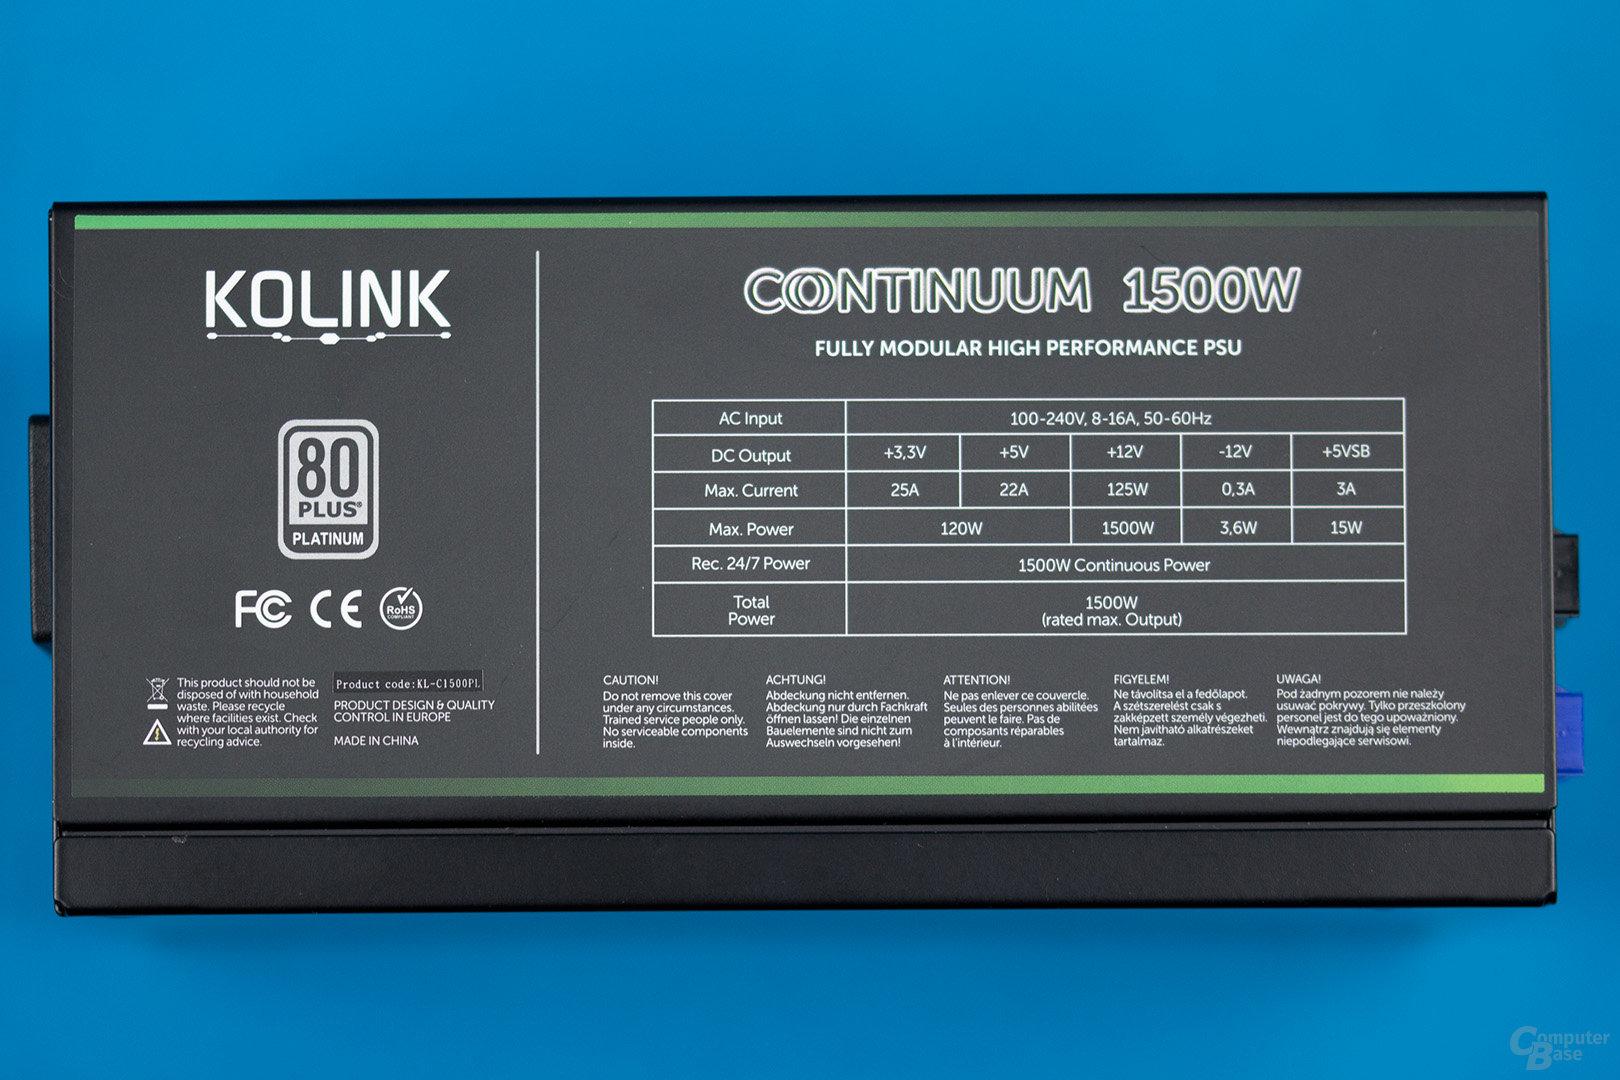 Kolink Continuum 1500W